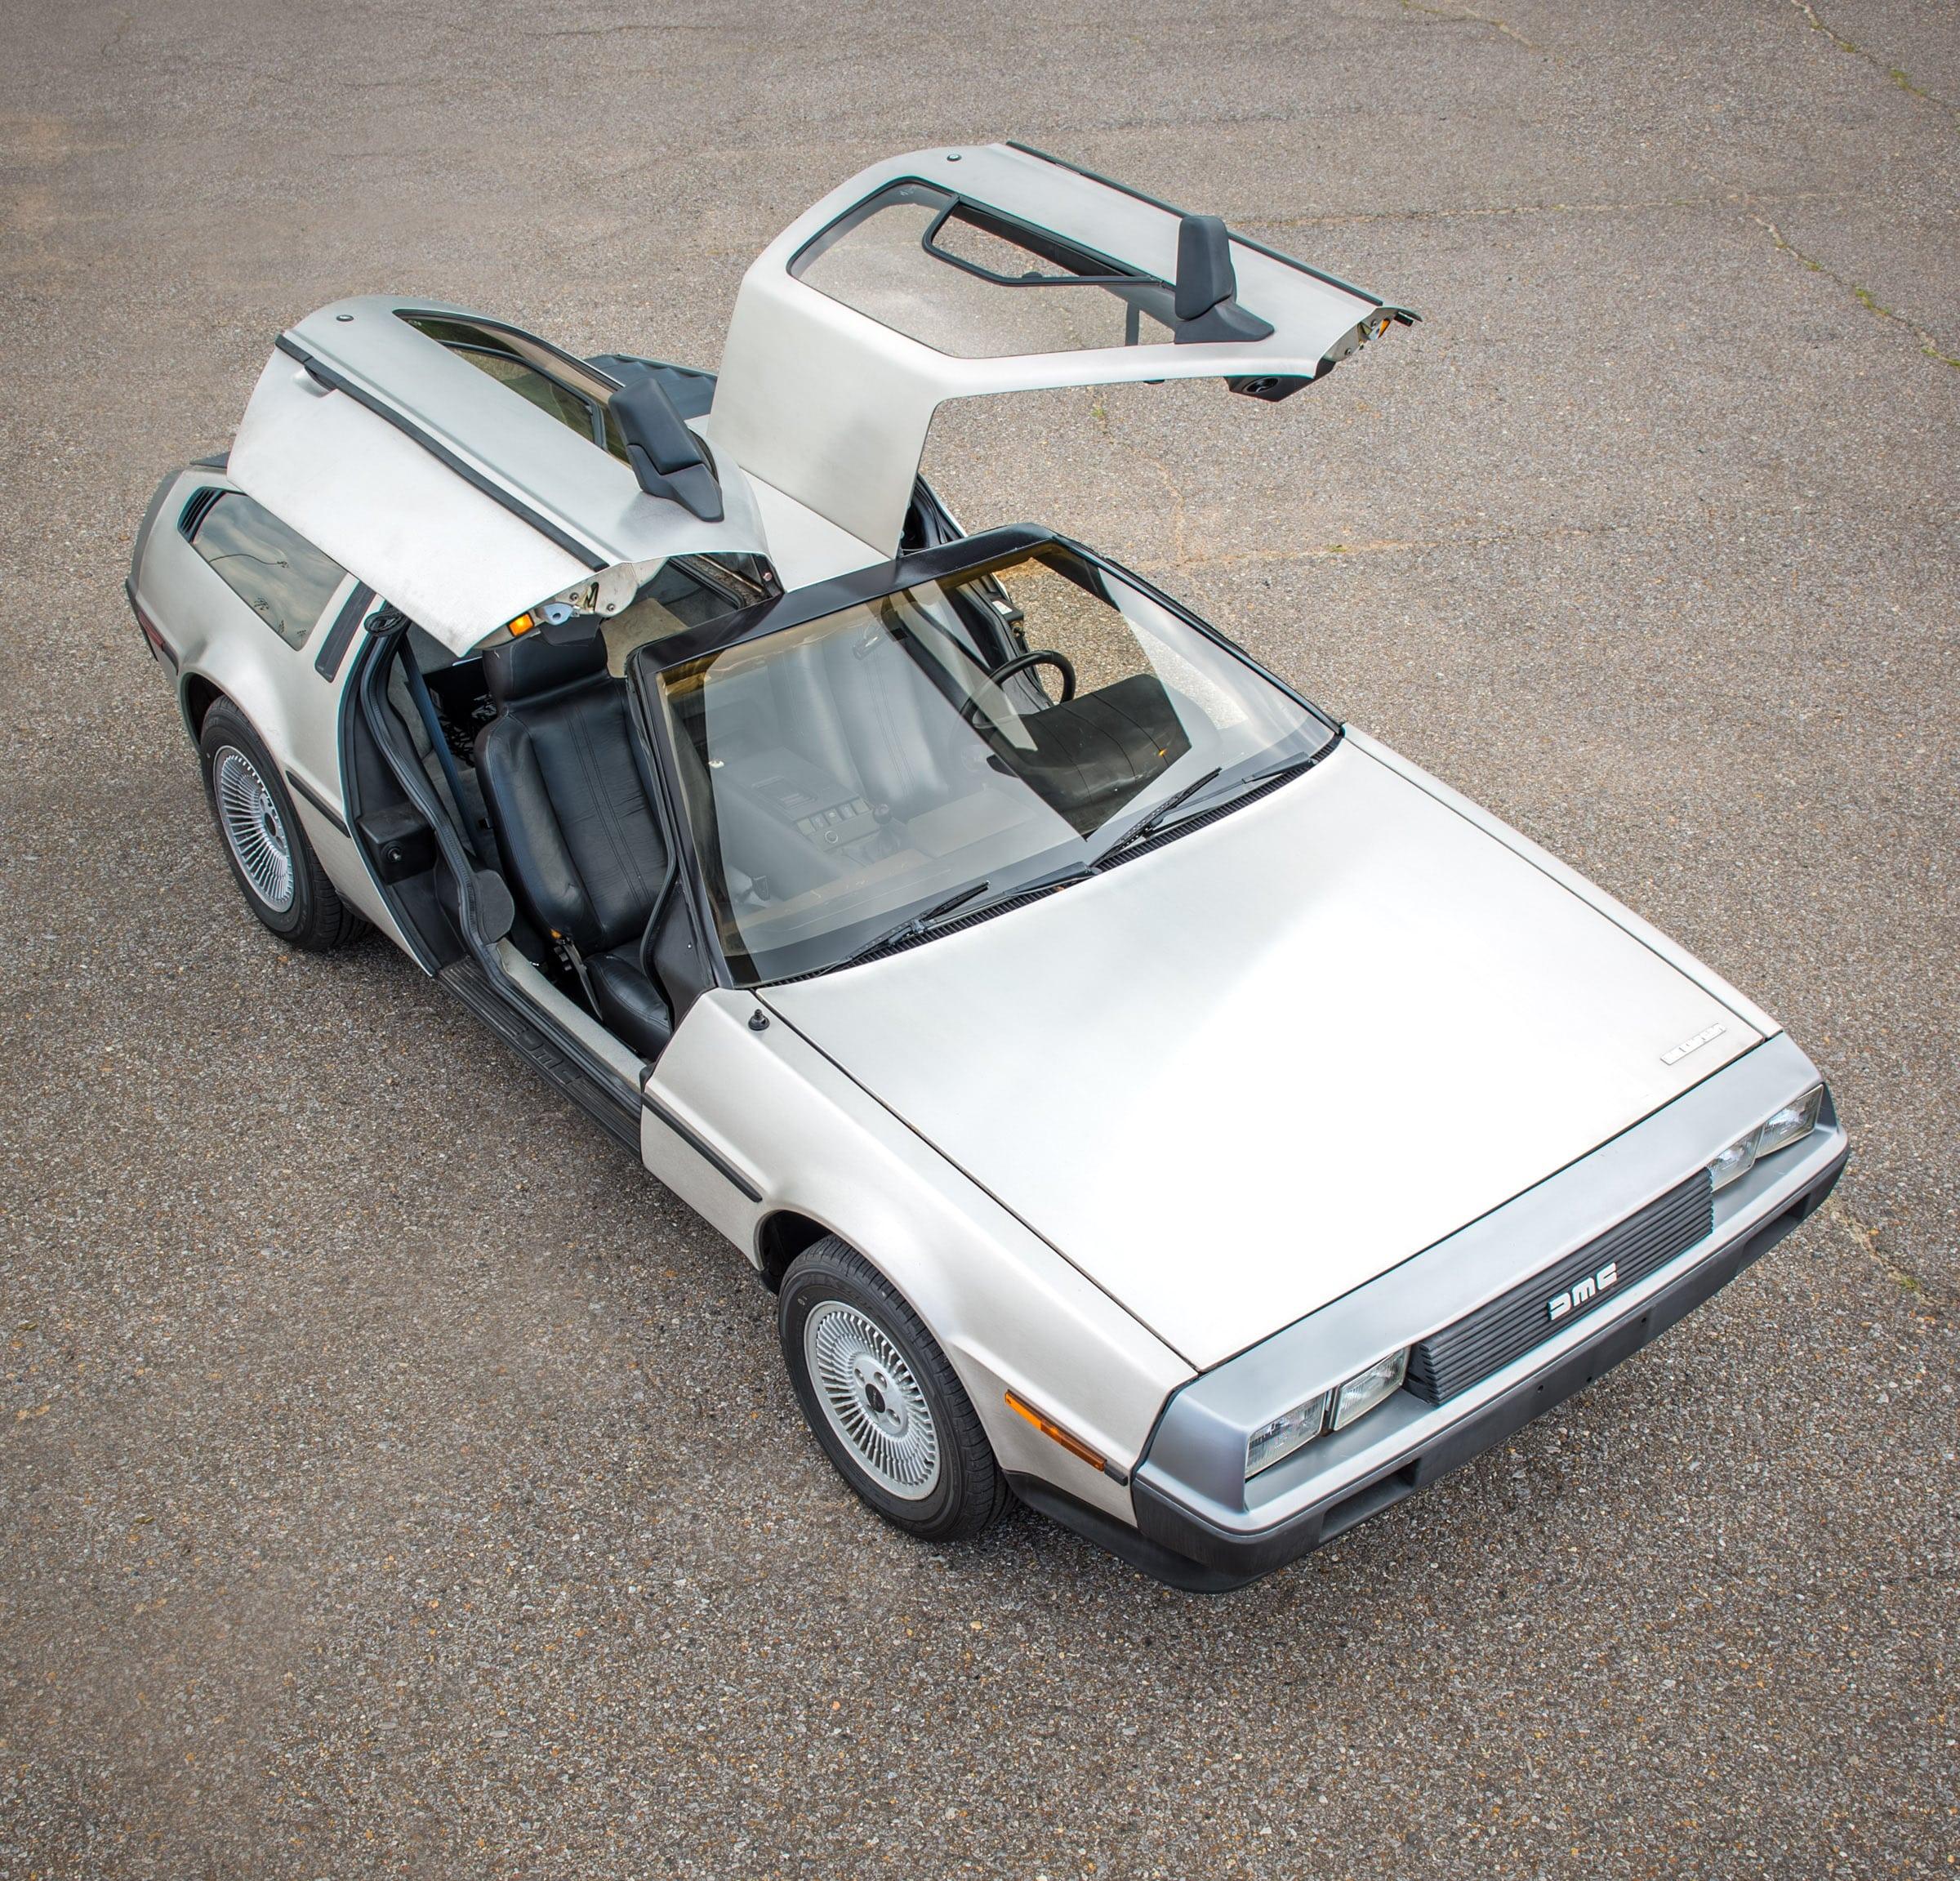 1982 DeLorean DMC-12 Article | William Horton Photography